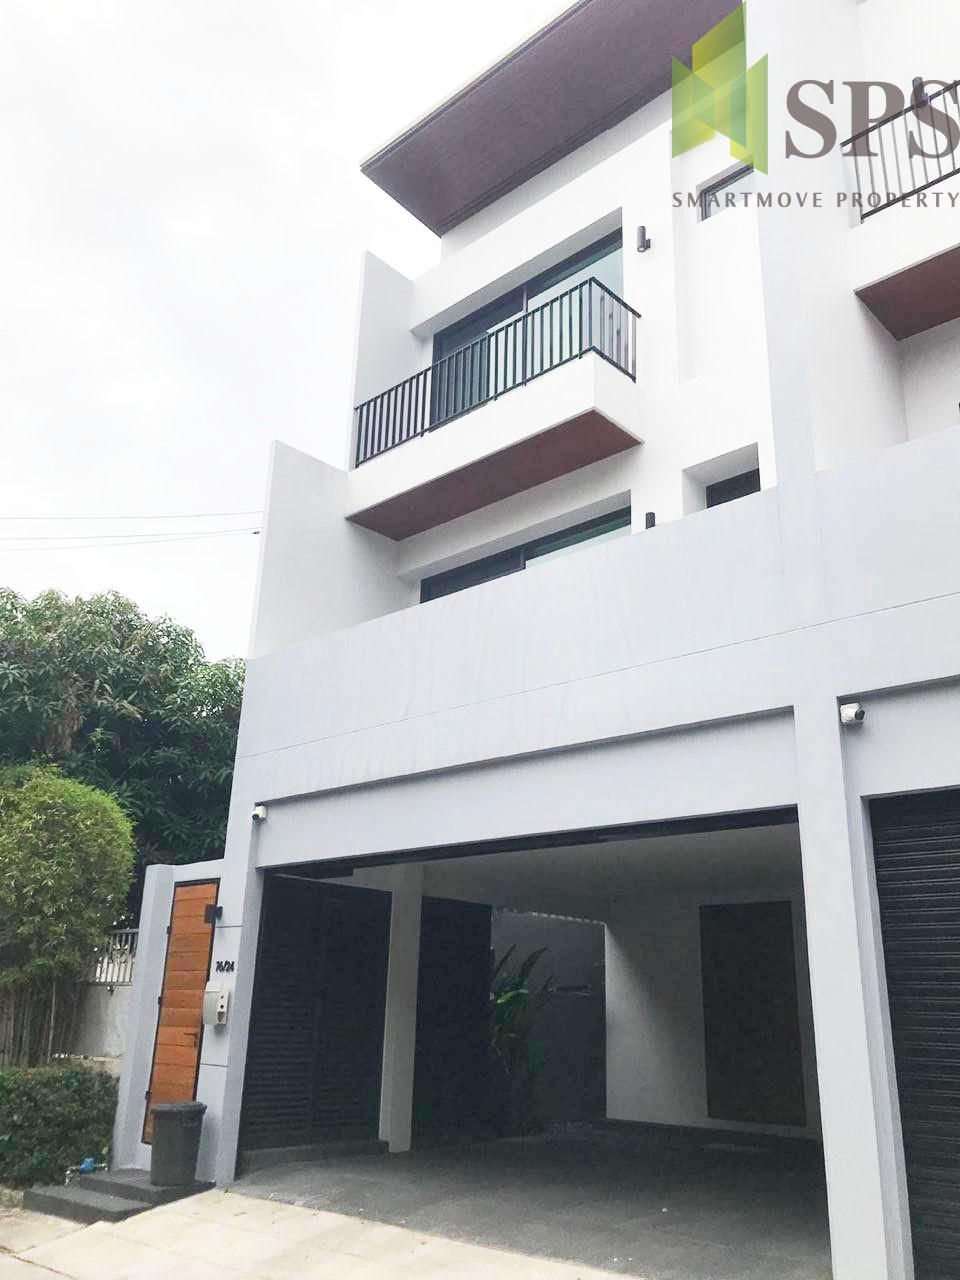 For Rent Detached House 3 Storey ,Sukhumvit 39, fully furnished(Property ID: SPS-PN261)